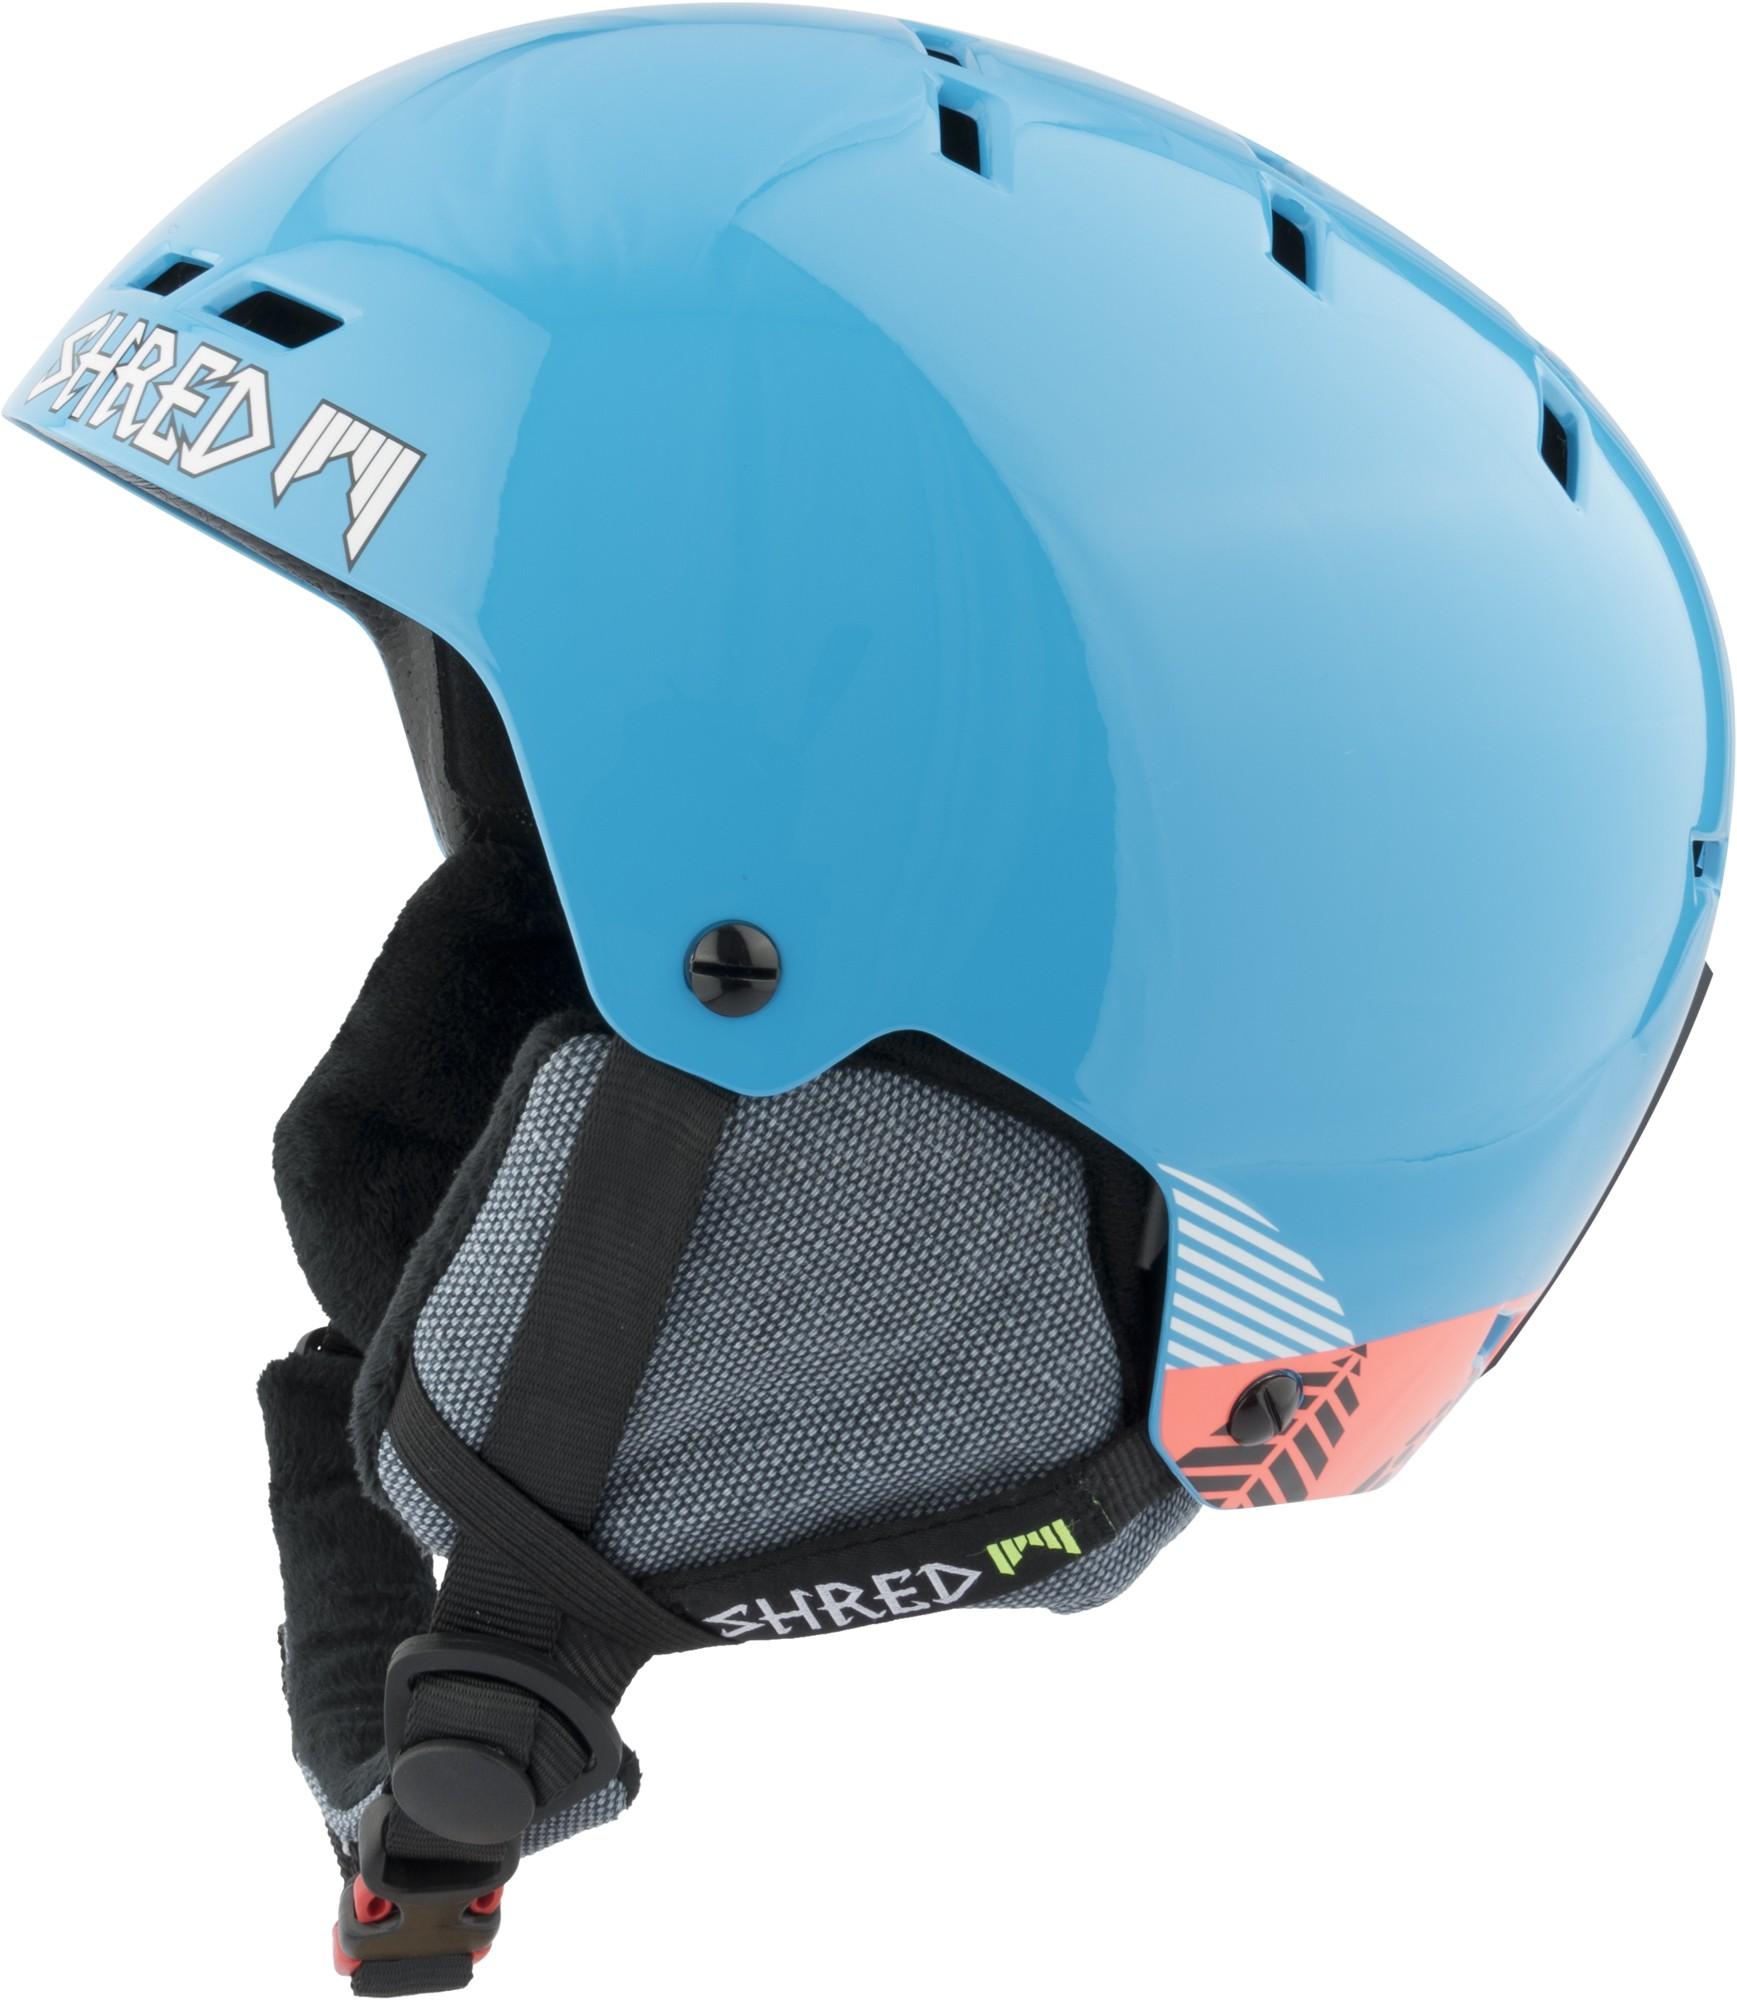 Shred BUMPER NoShock warm TIMBER ski helmet, 2017